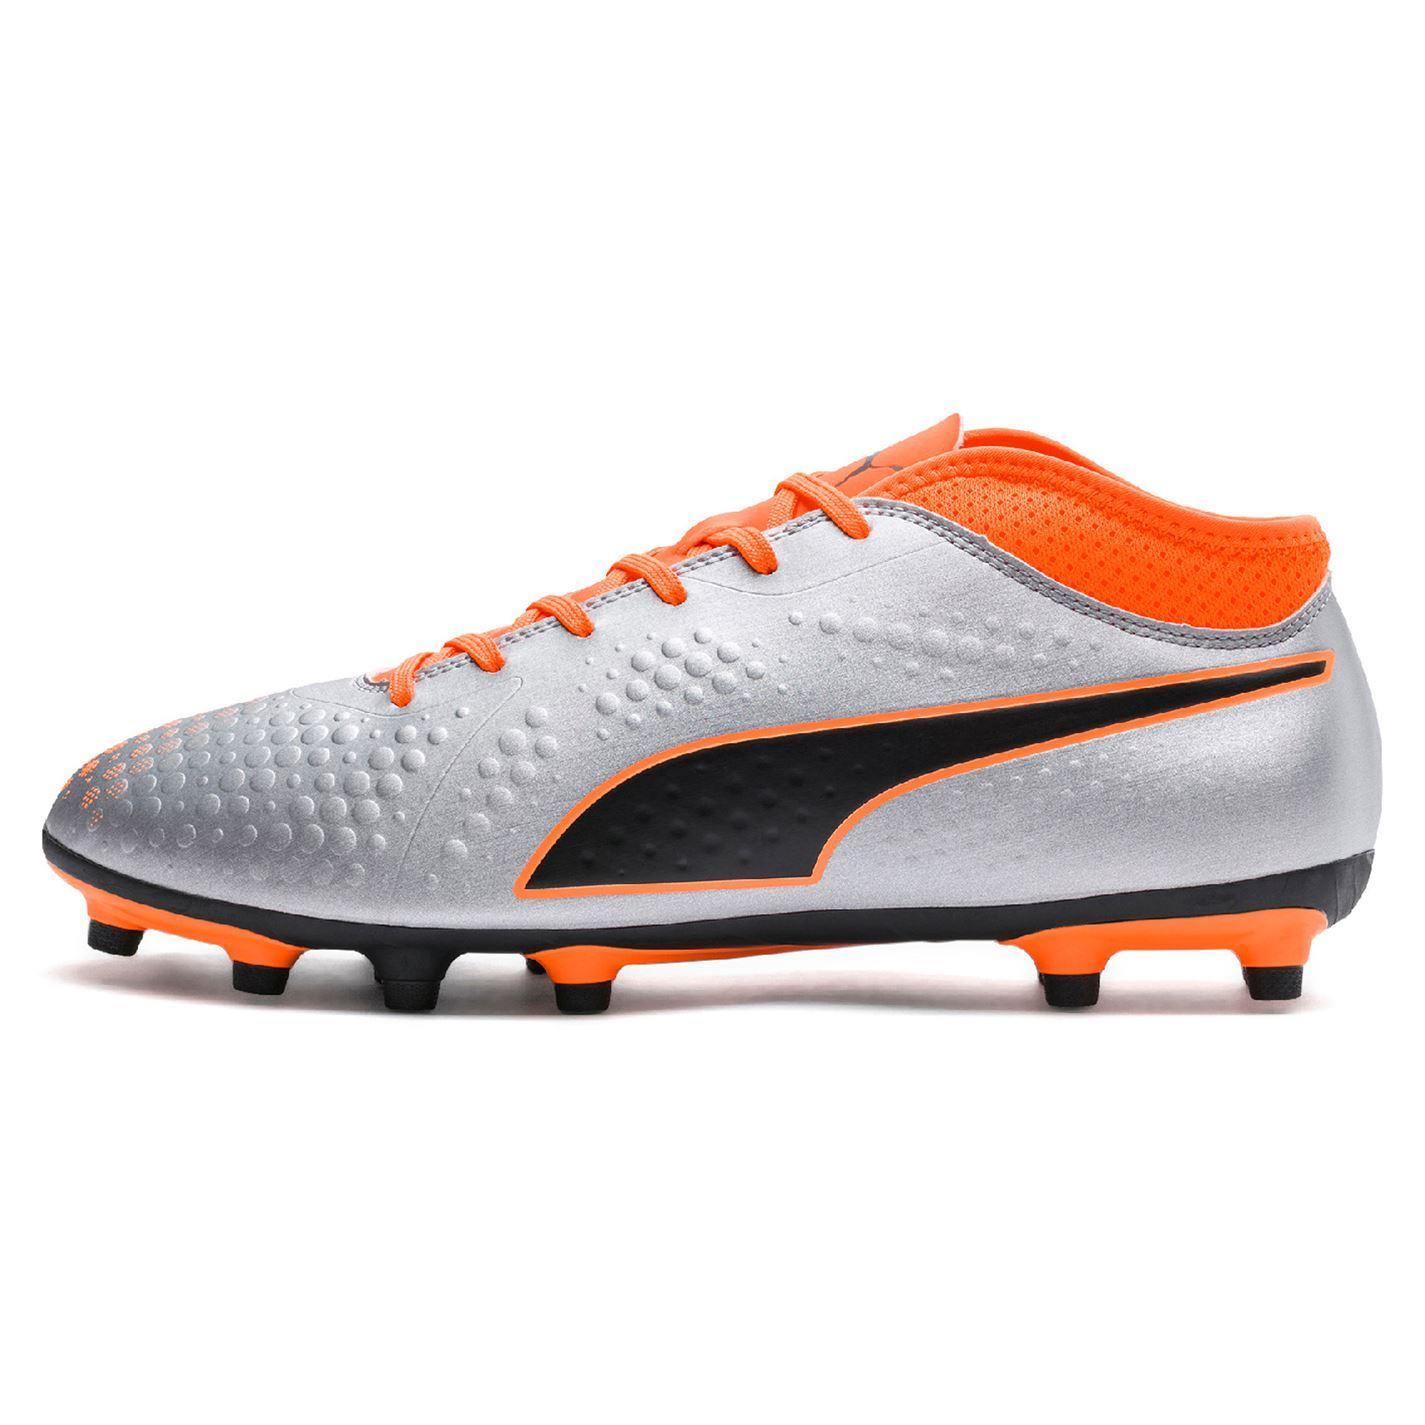 miniature 8 - Puma 4 FG Firm Ground Chaussures De Football Homme Football Chaussures Crampons